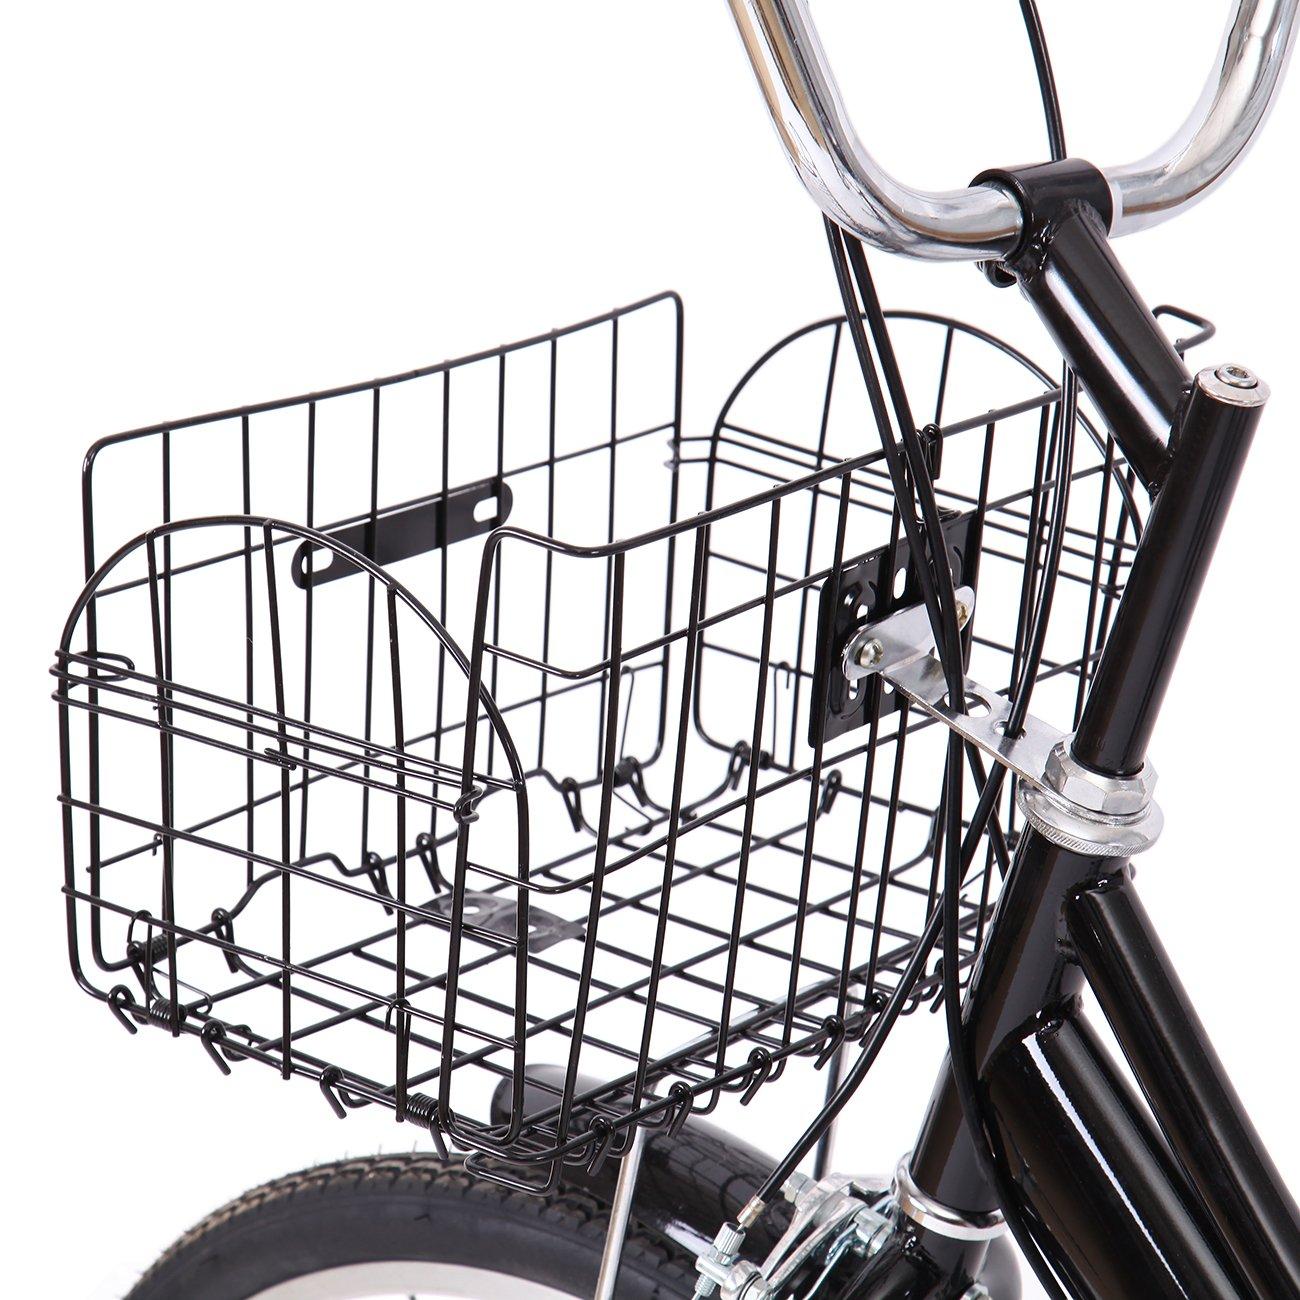 Yonntech Triciclo per Adulti 05